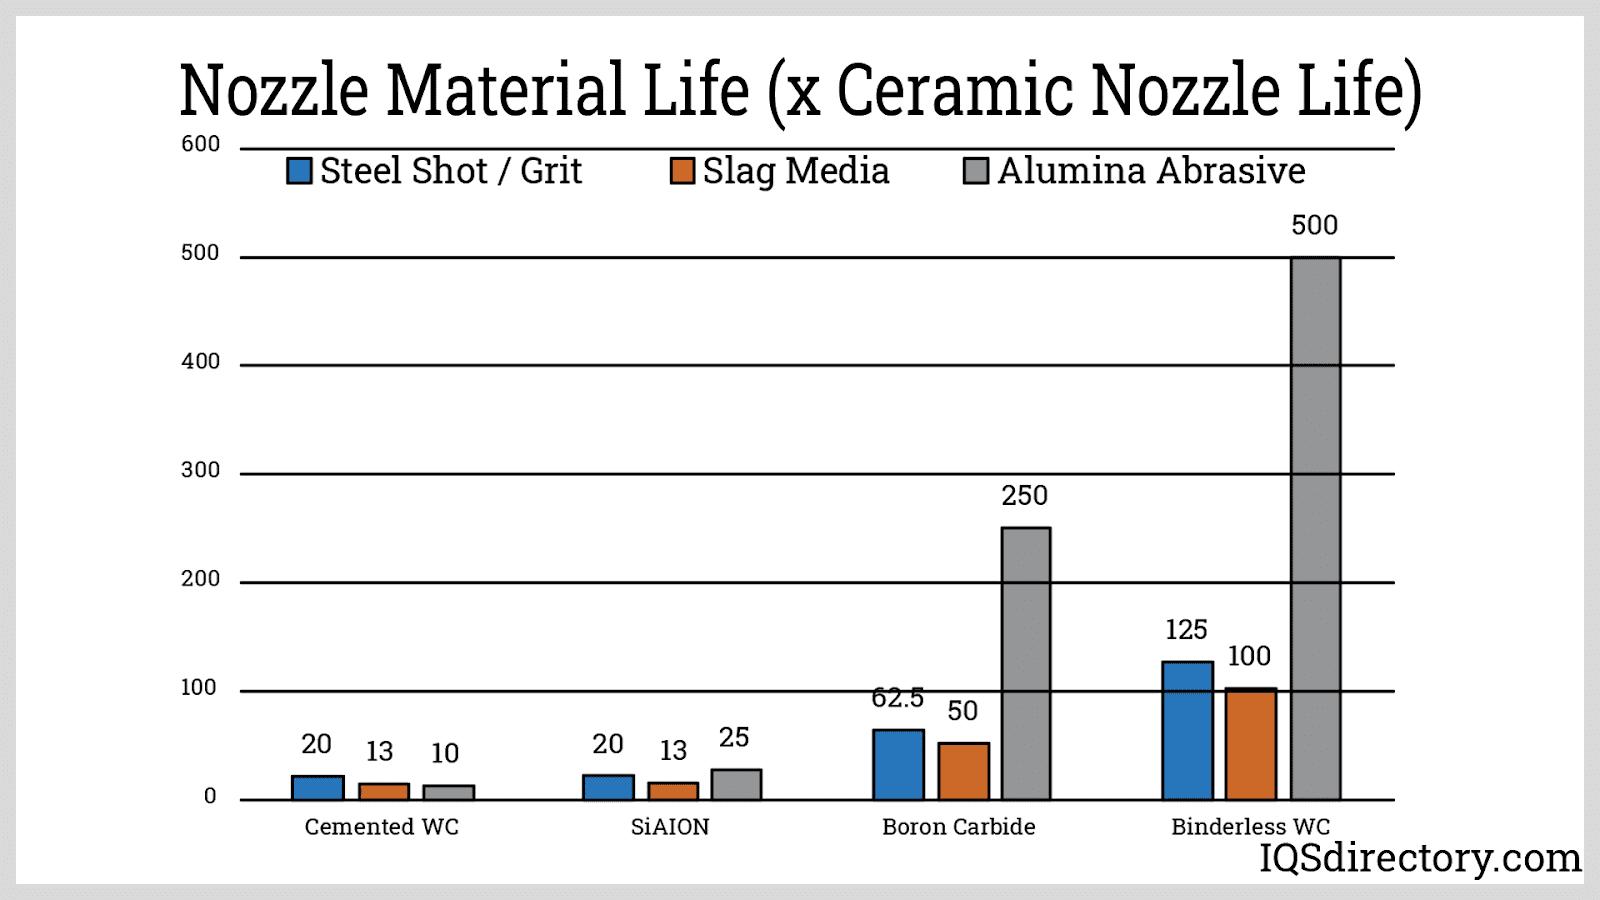 Nozzle Material Life (x Ceramic Nozzle Life)